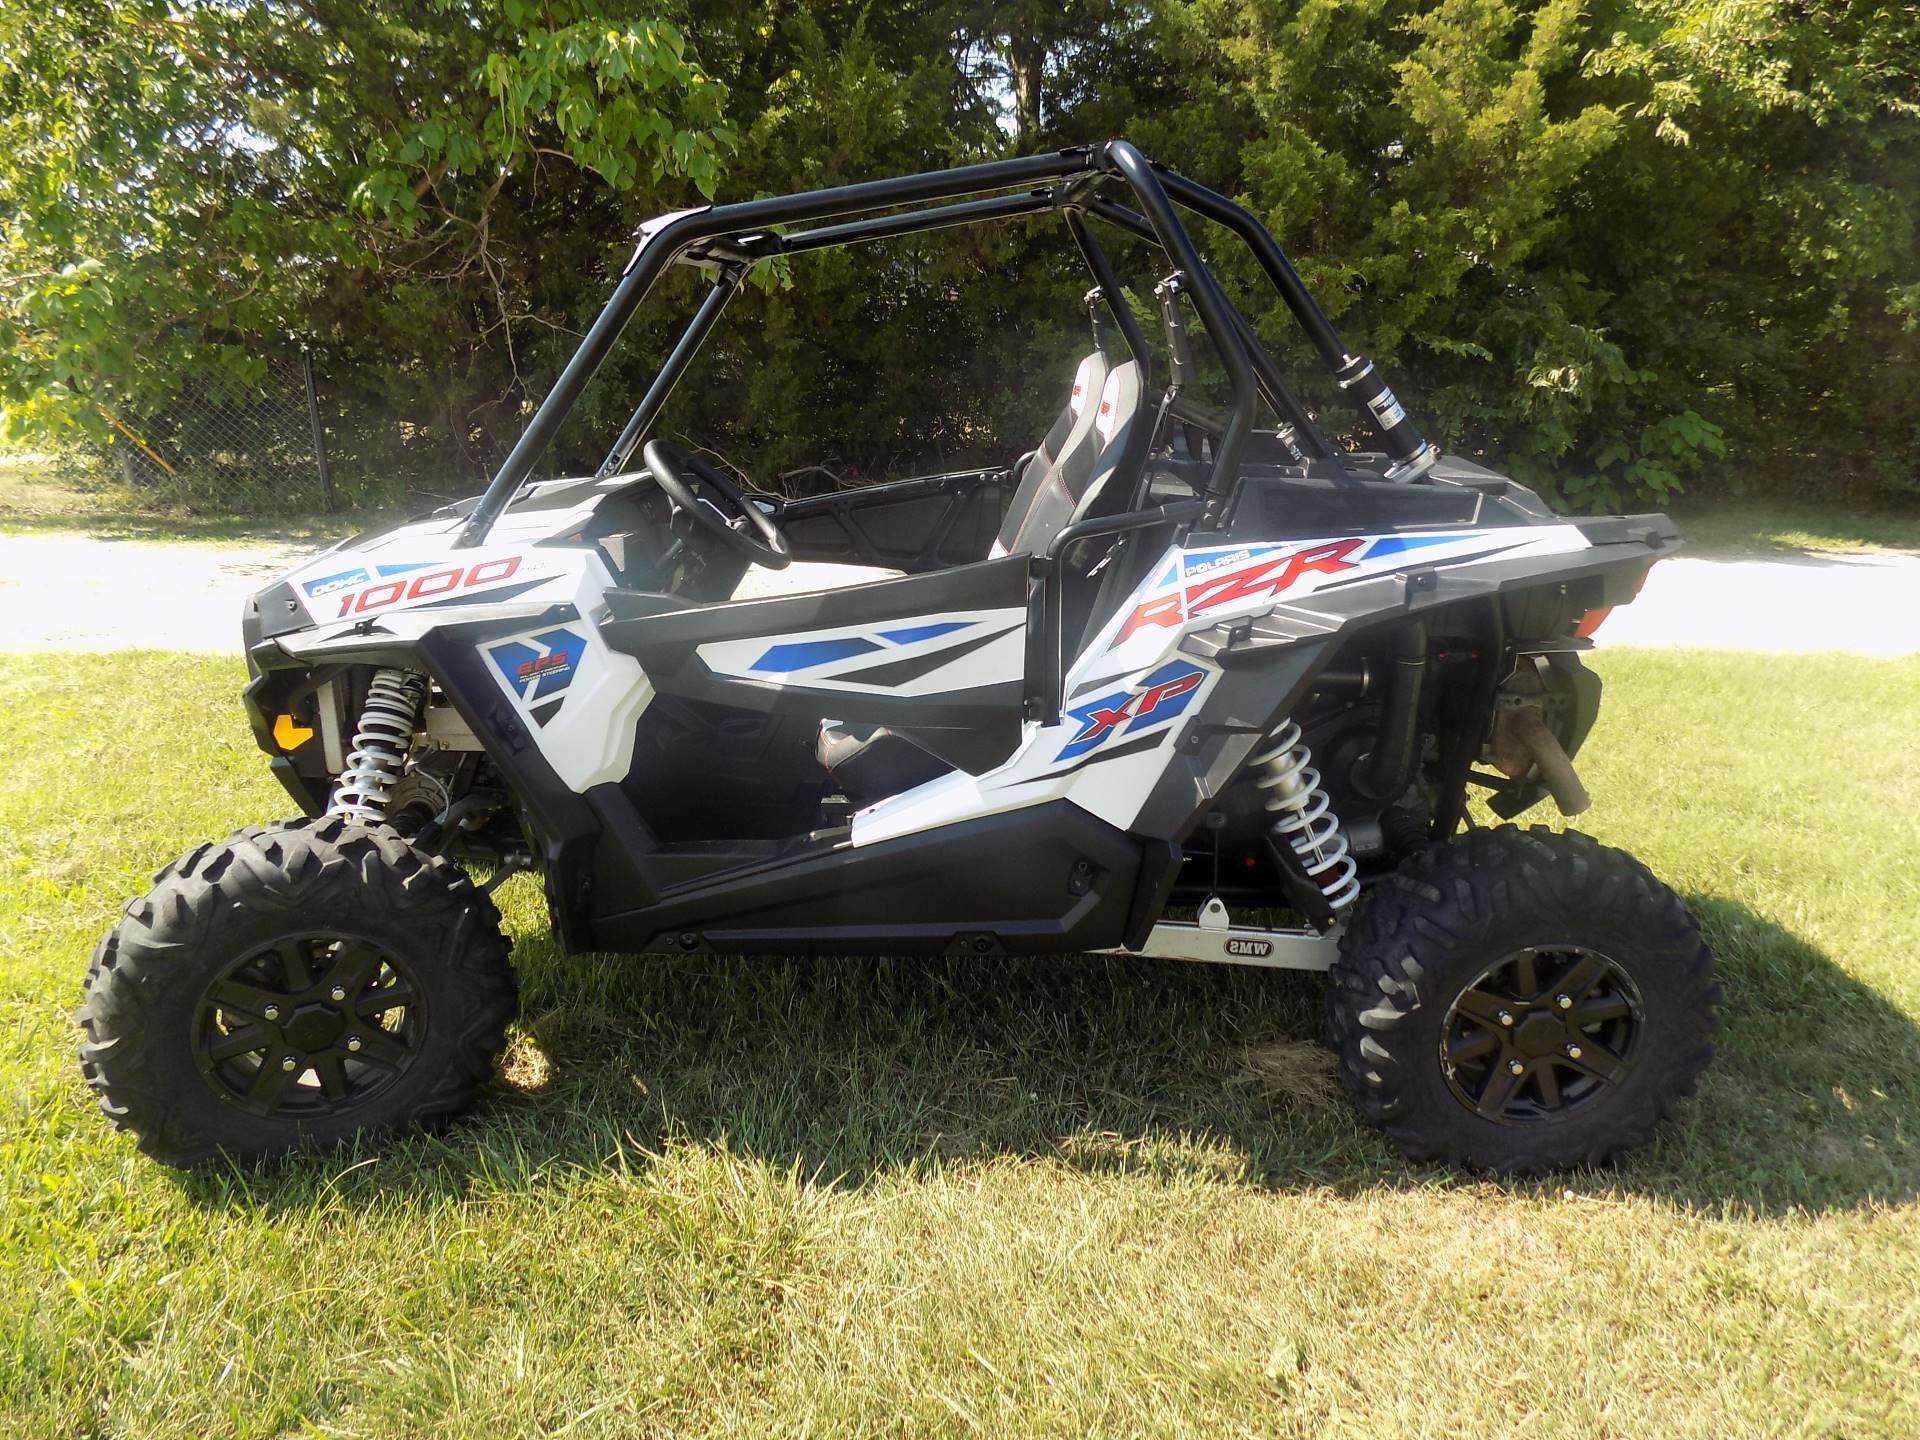 2015 Polaris RZR XP 1000 EPS for sale 49017